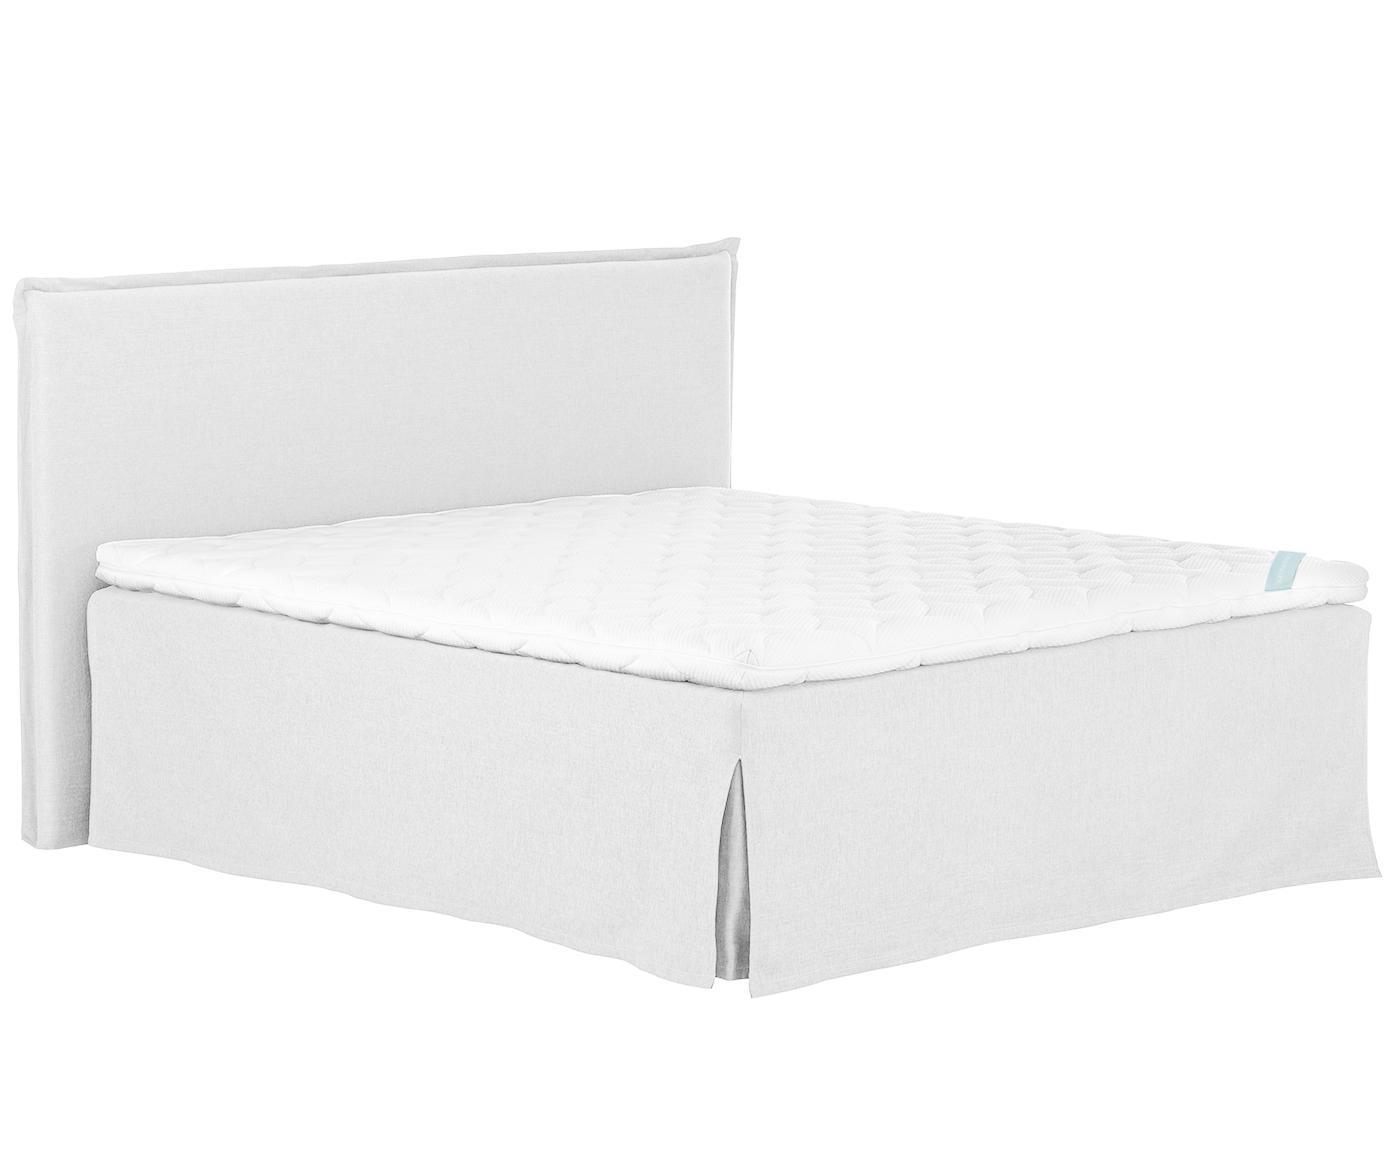 Premium Boxspringbett Violet, Matratze: 7-Zonen-Taschenfederkern , Hellgrau, 140 x 200 cm